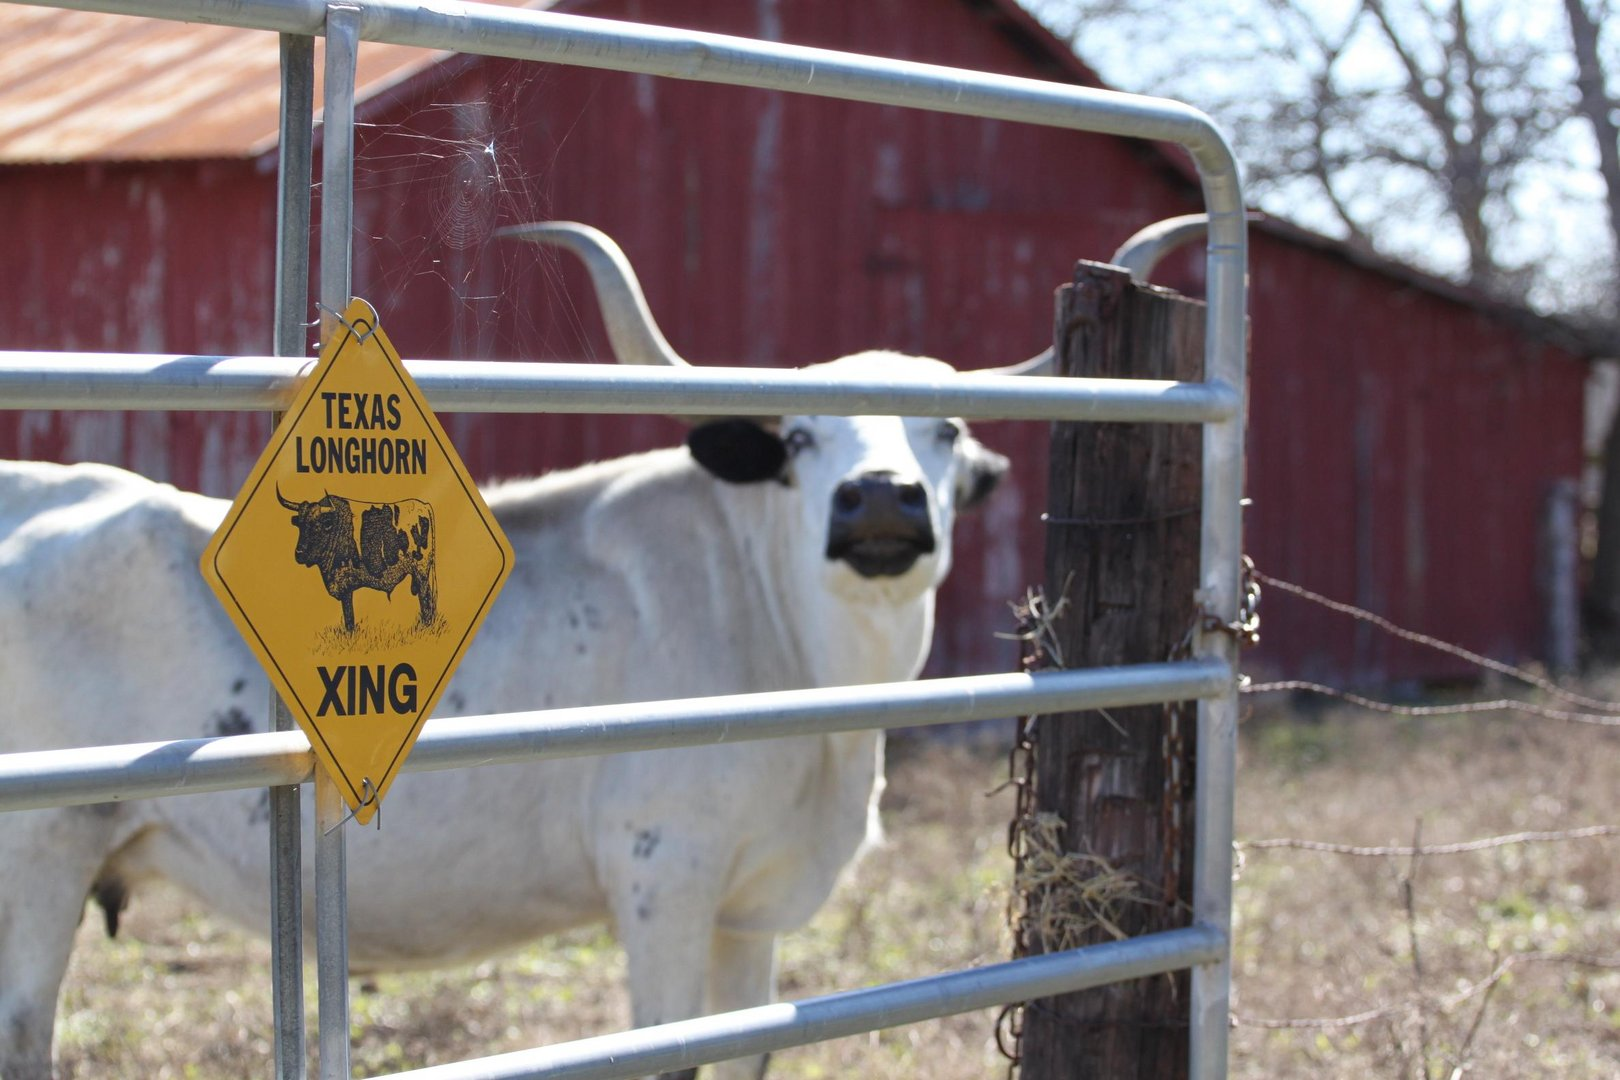 Texas Longhorns Xing